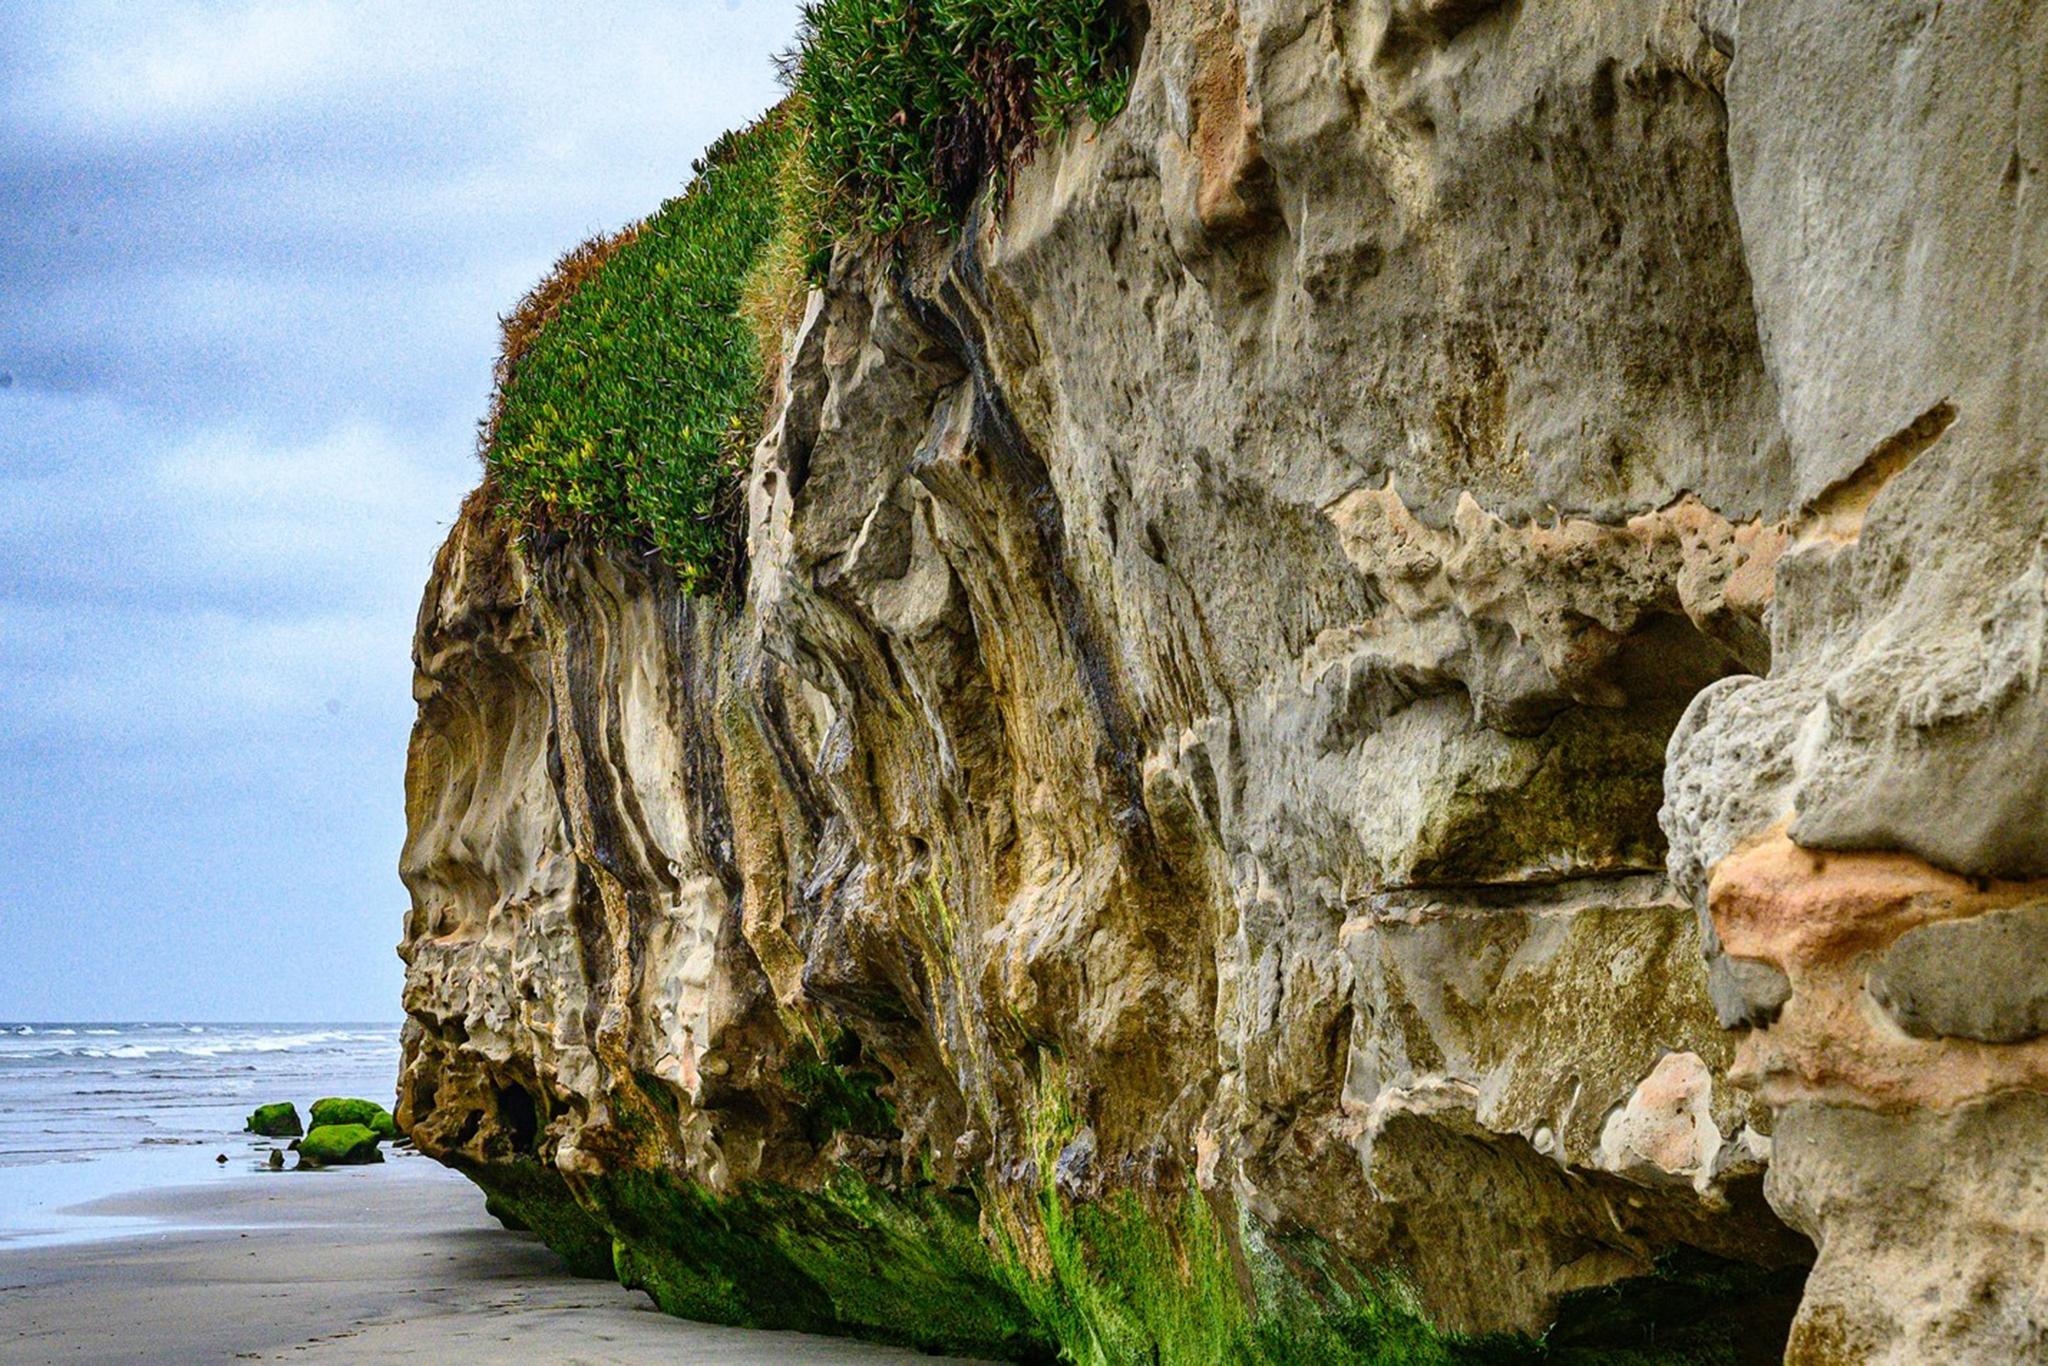 Hike Carlsbad Beach, bluffs, & seawall from Buena Vista Lagoon to North Ponto Beach